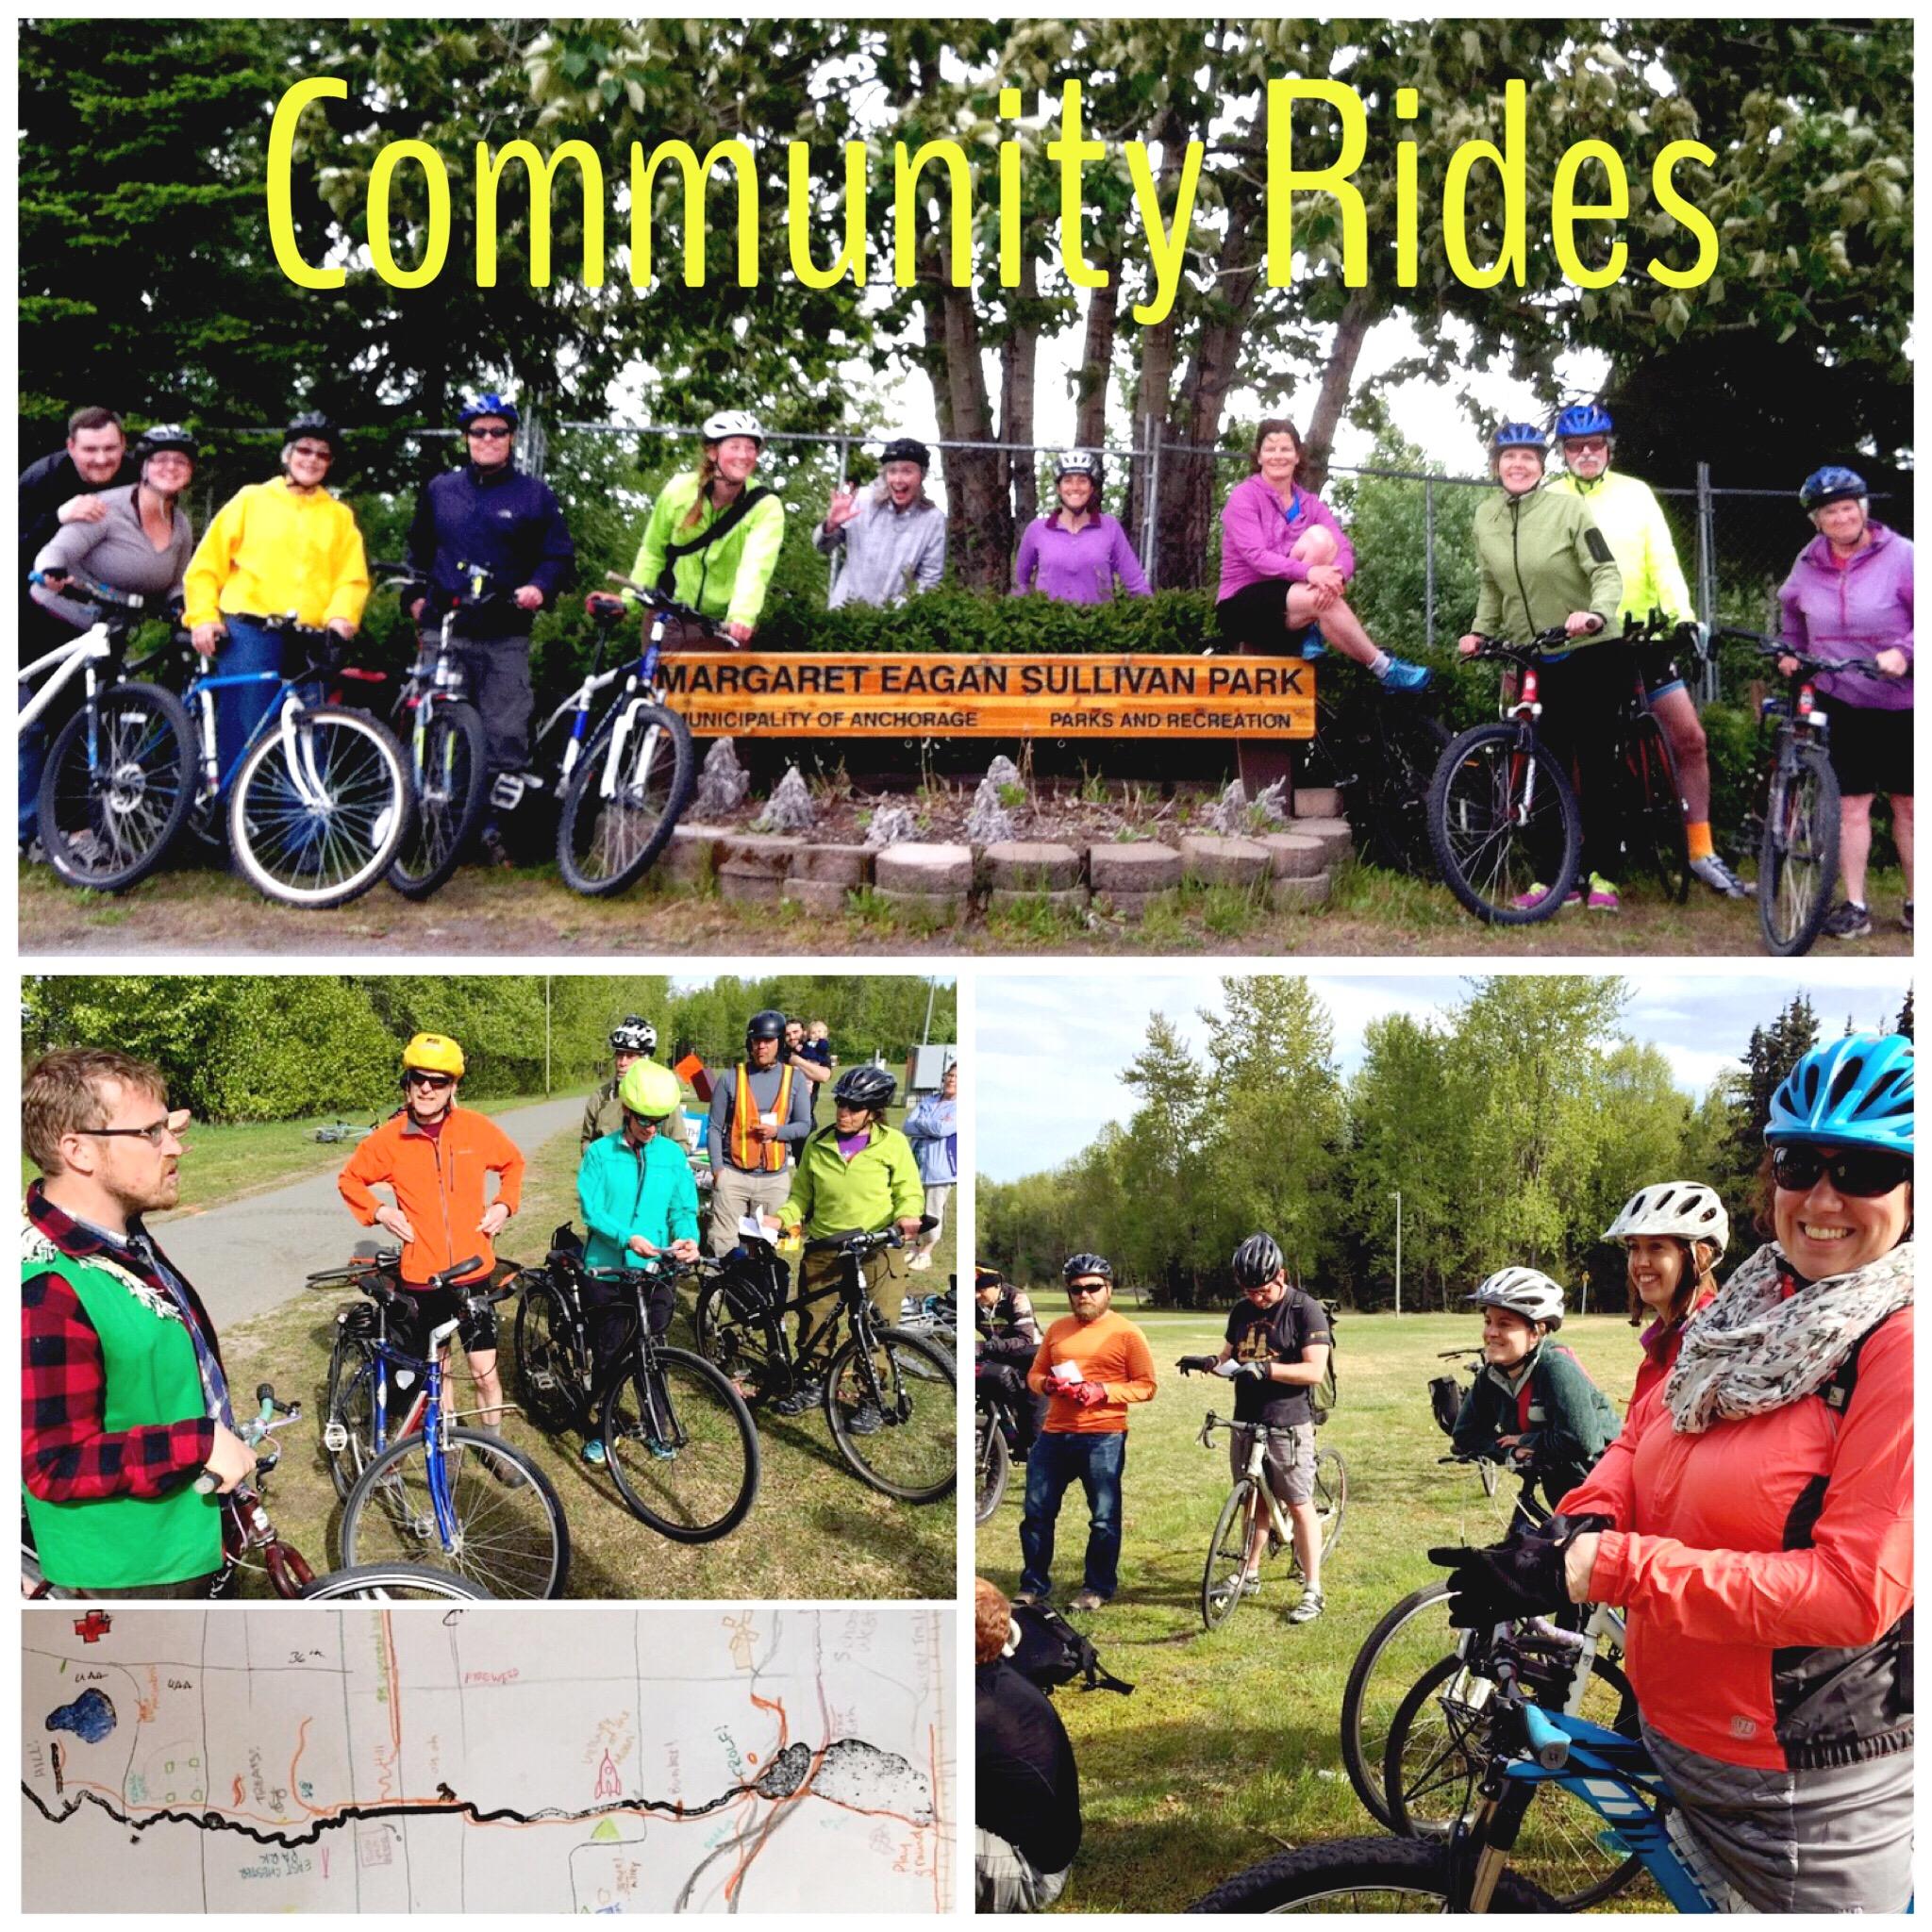 Community_Rides.JPG